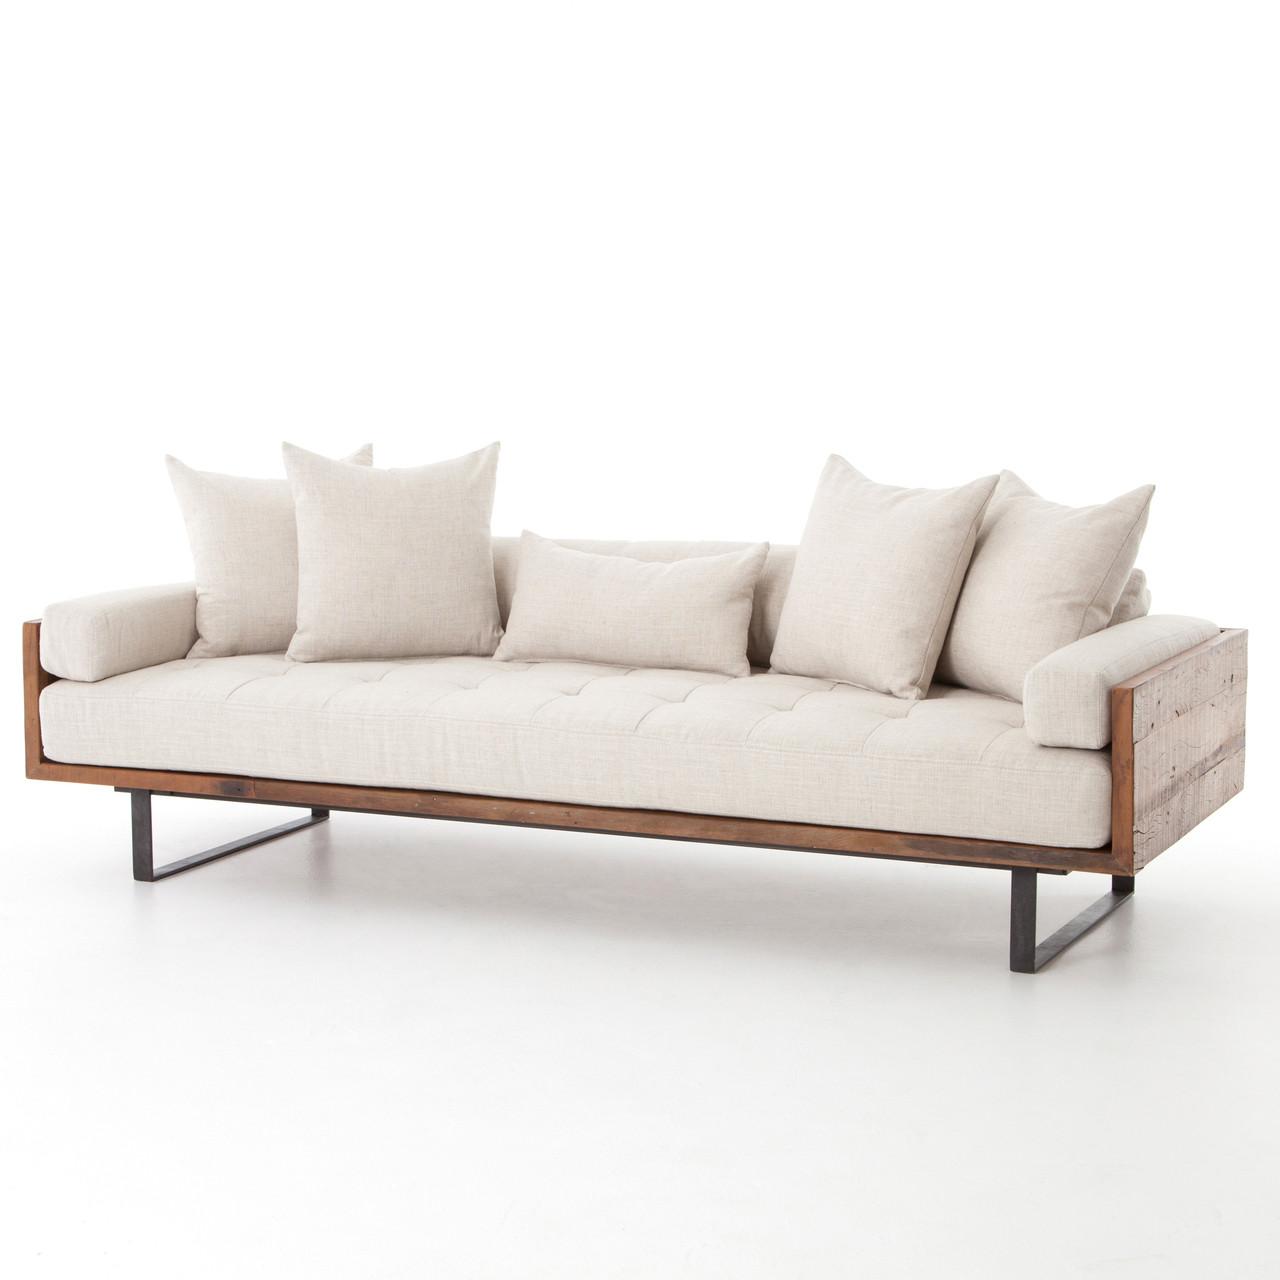 Industrial furniture sofa - Ranger Industrial Loft Reclaimed Wood Sofa Natural Linen